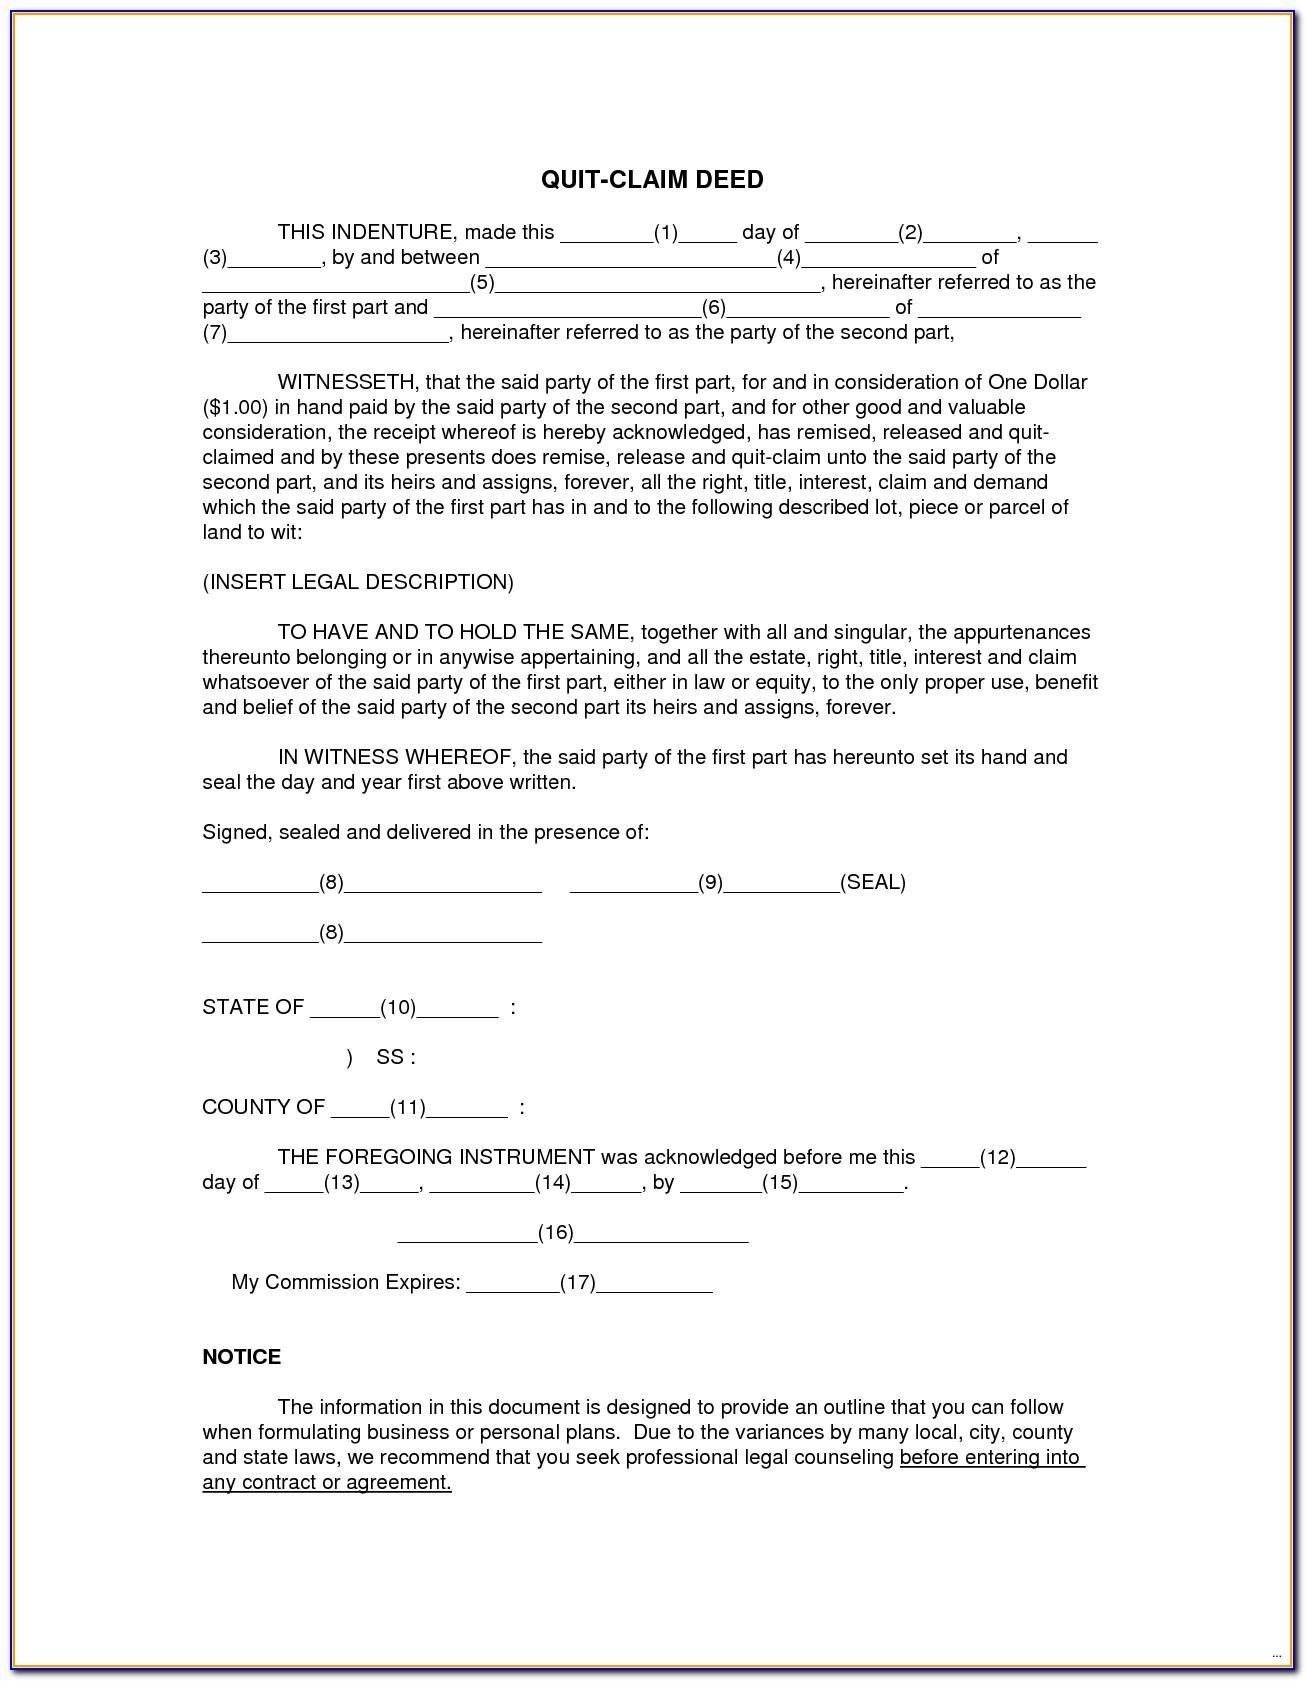 Quit Claim Deed Form Florida Orange County